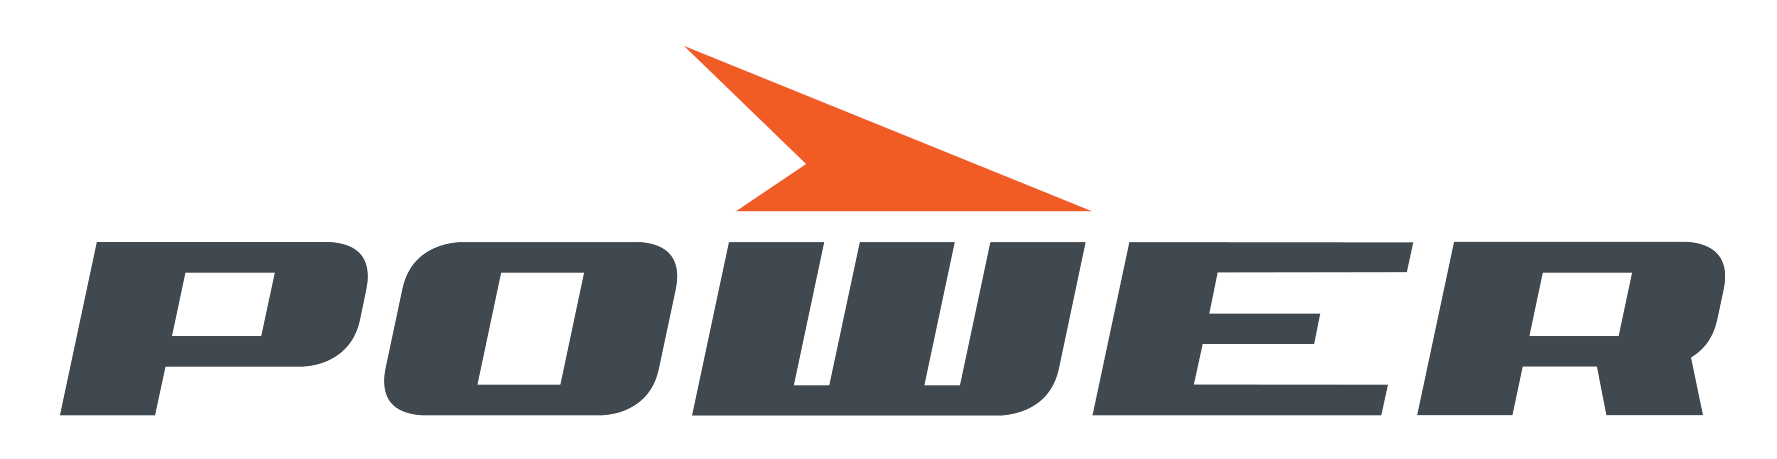 Power logo valkoinen